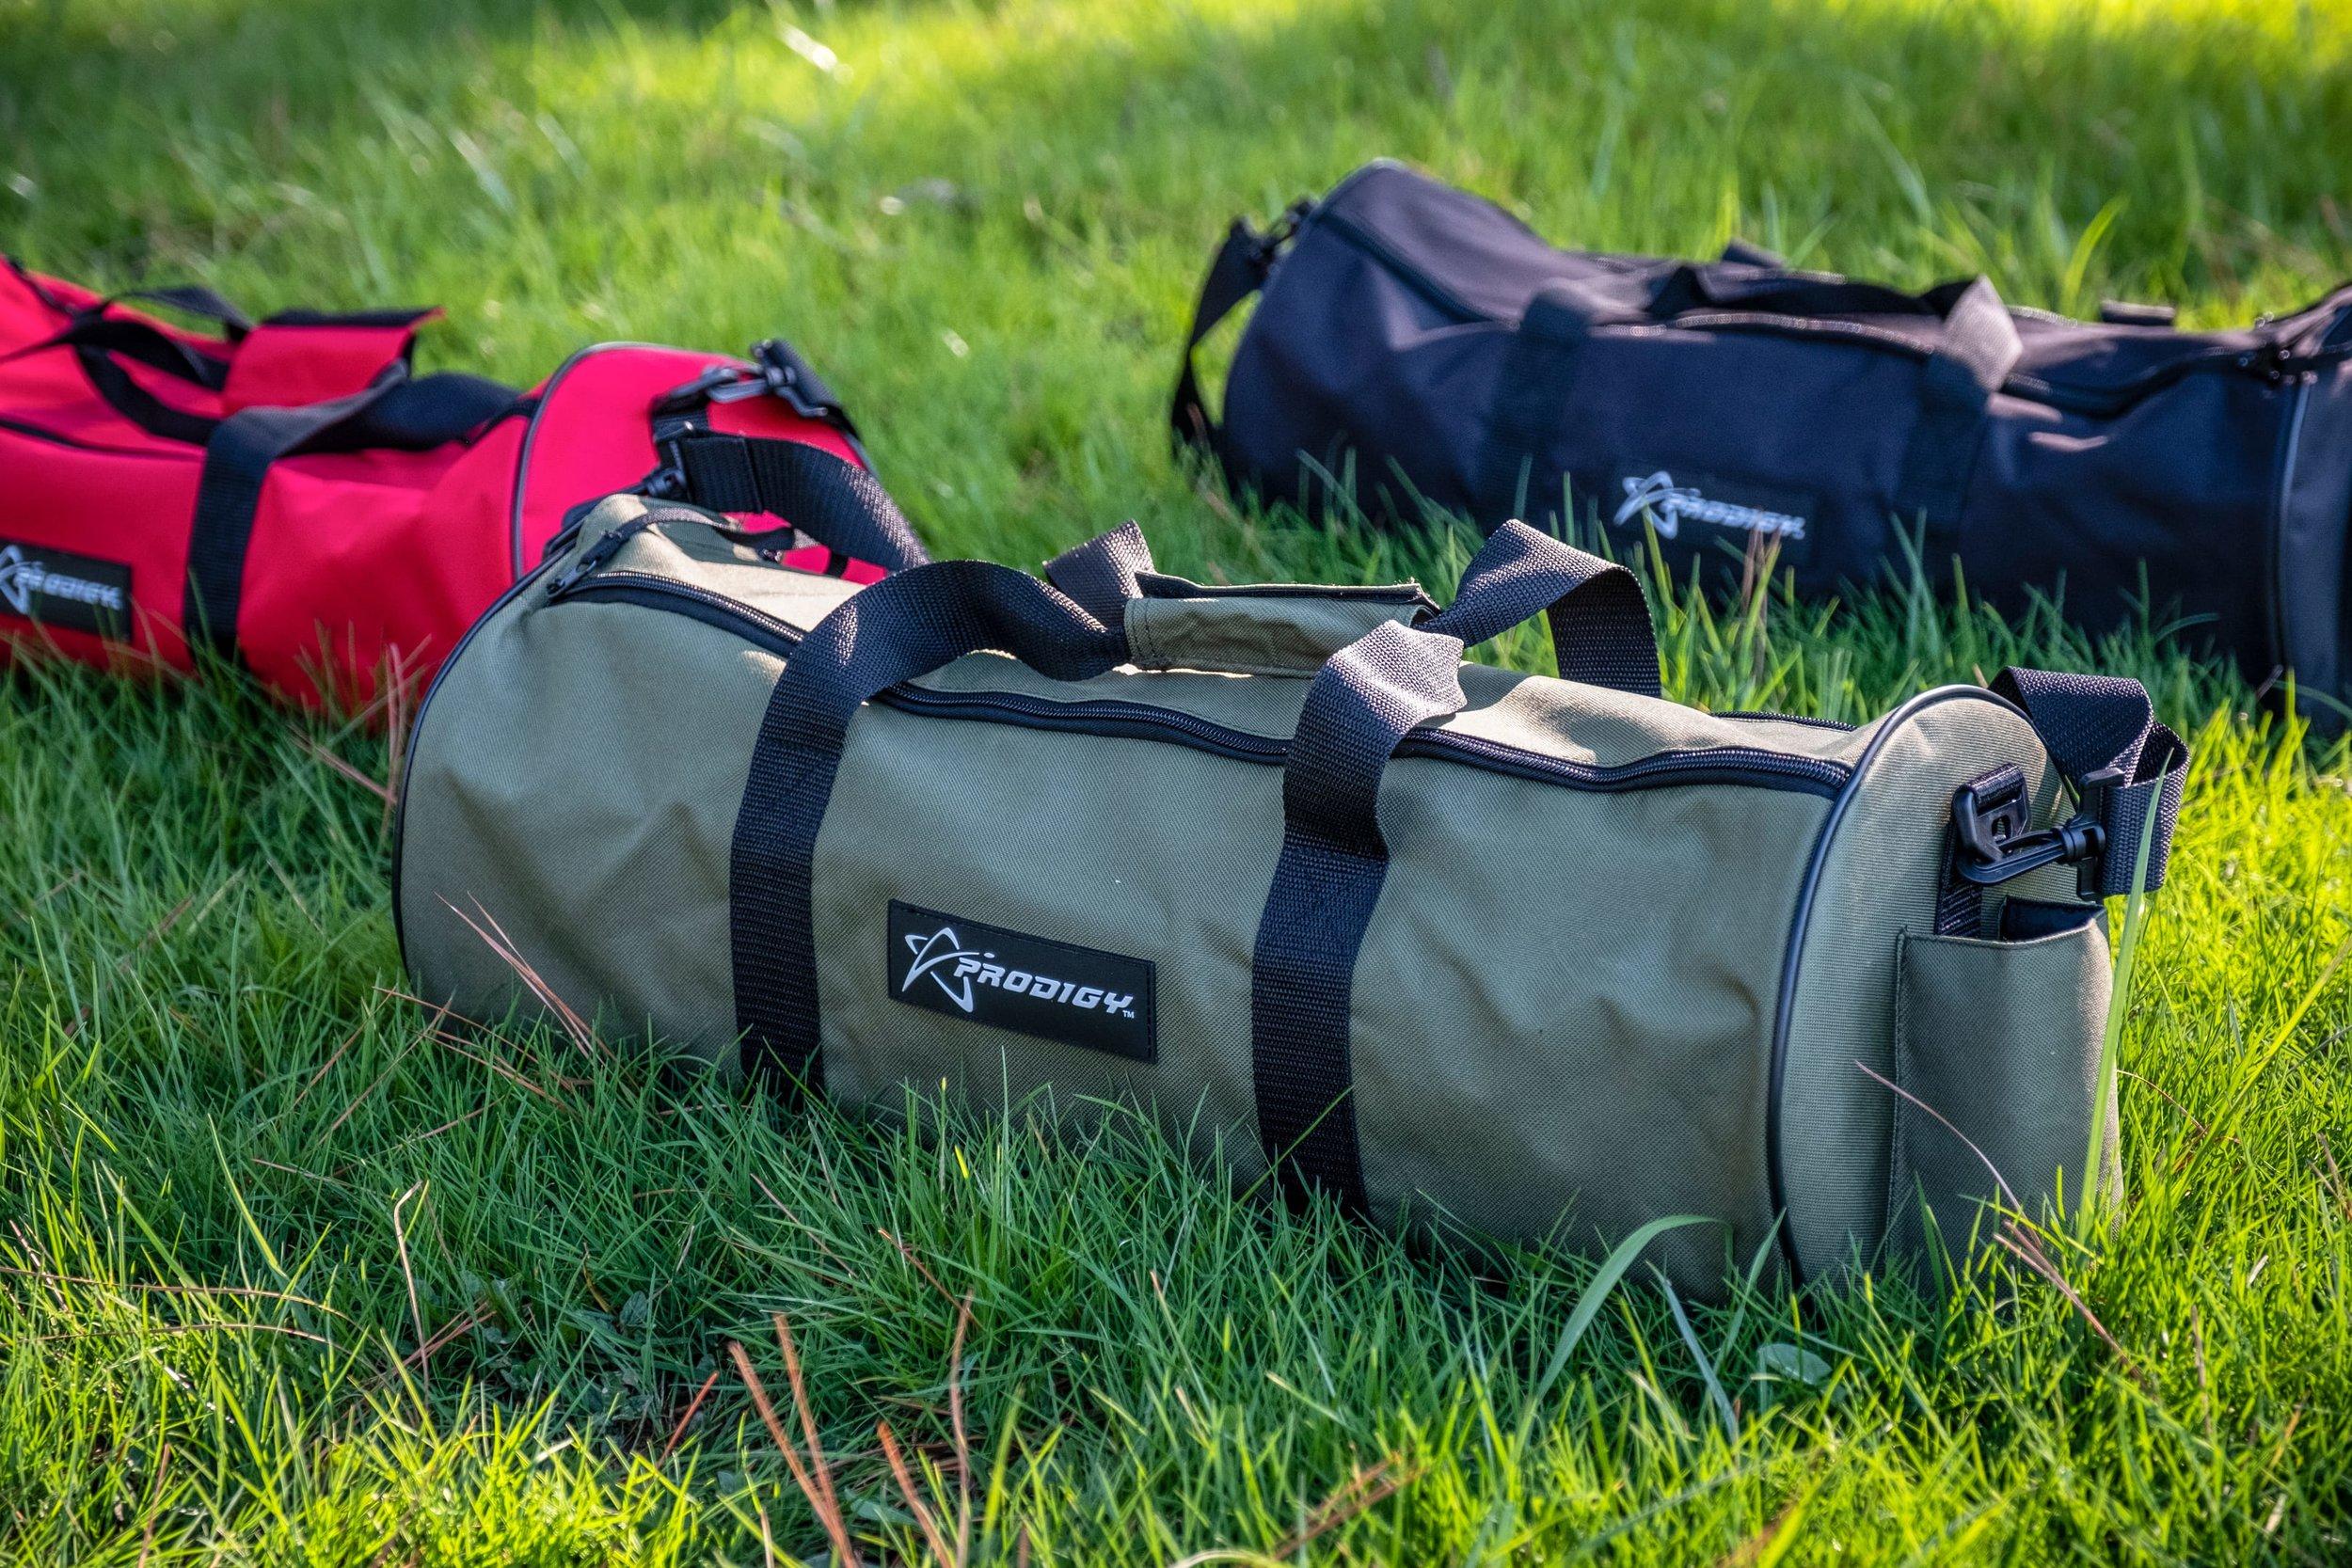 prodigy-practice-bag-v2-lifestyle-3_OPT.jpg